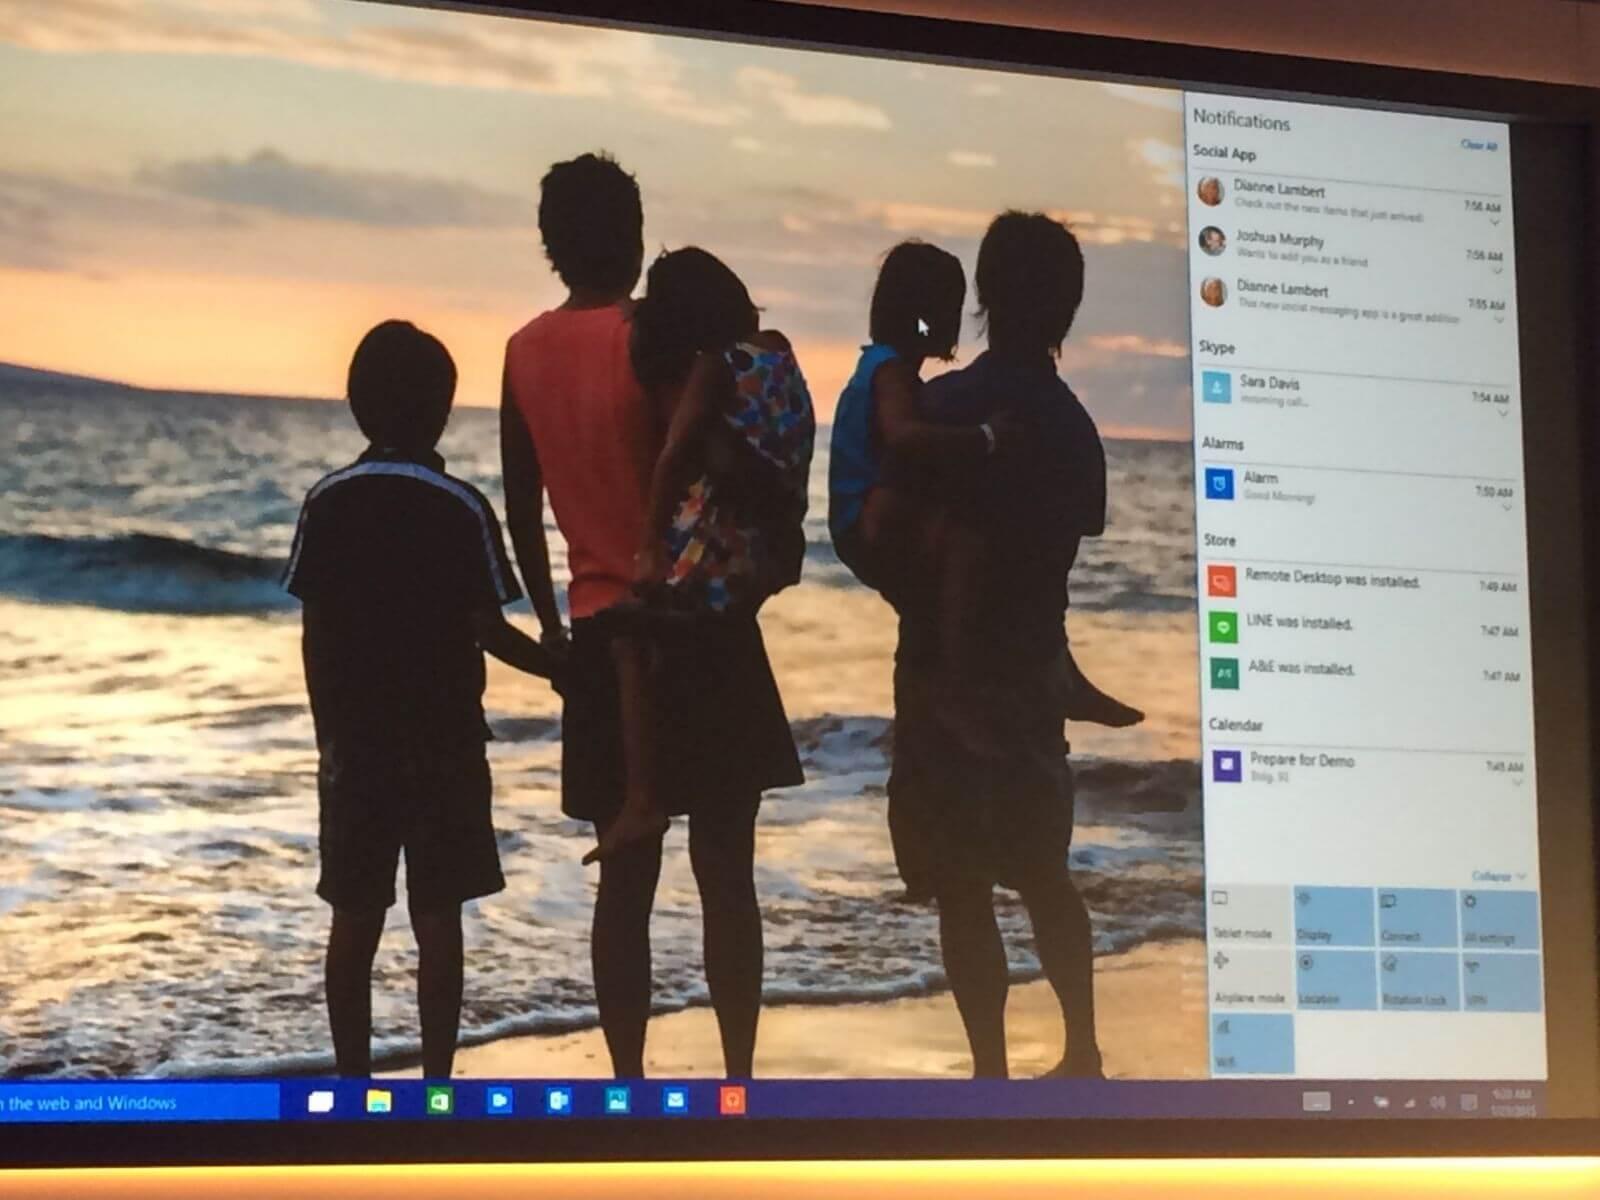 astazi ora 19 00 pe www yoda ro live text prezentarea windows 10 microsoft dezvaluie noul sistem de operare 2   Datel IT Web design ,creare site,realizare site,magazin online,blog